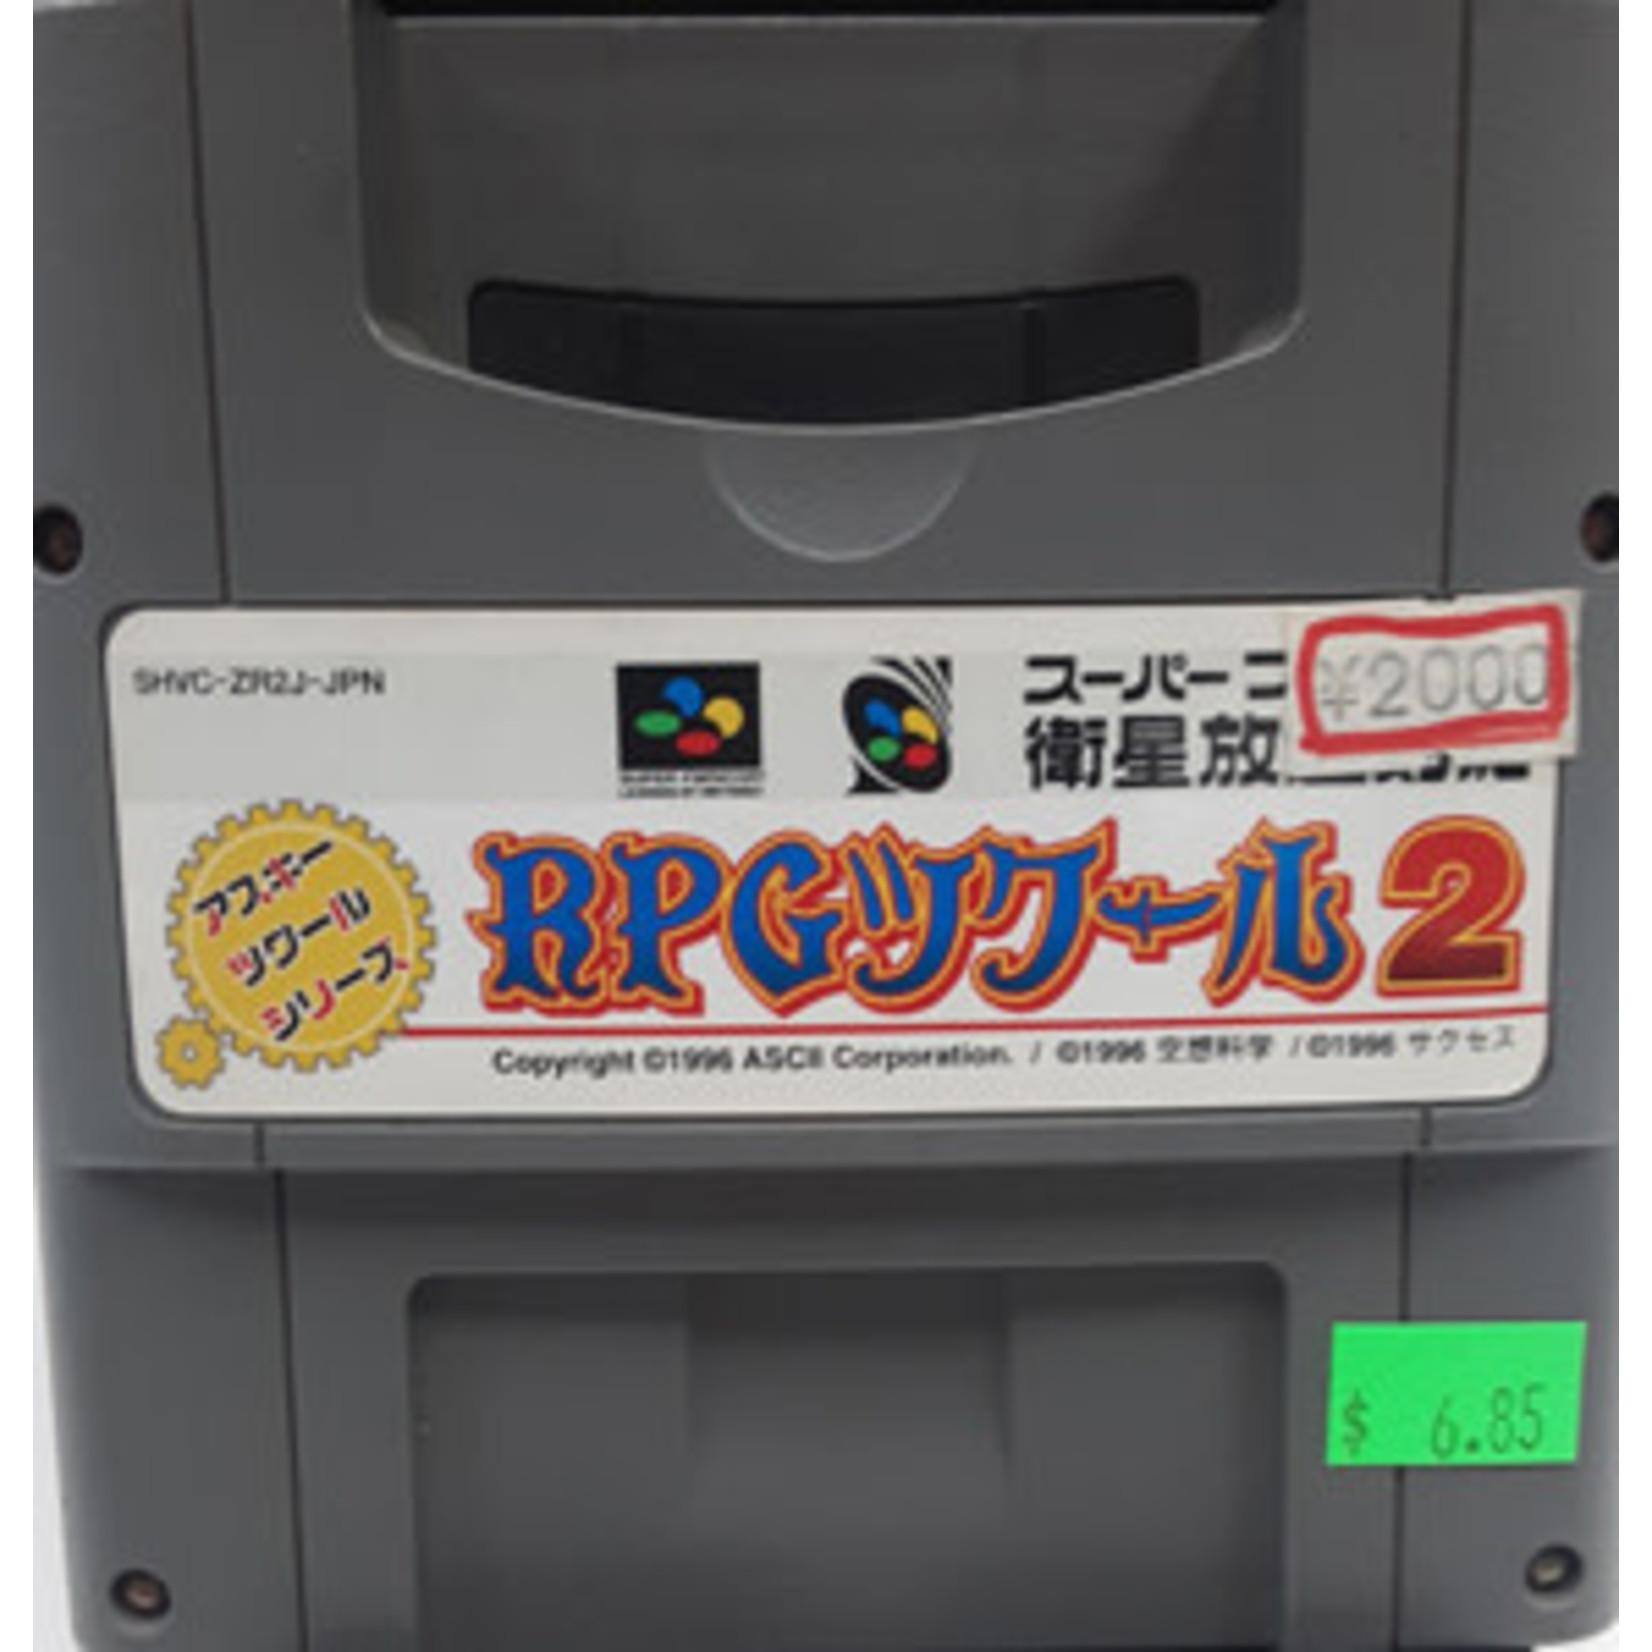 IMPORT-SFCU-RPG maker 2 tsukuru Sword World